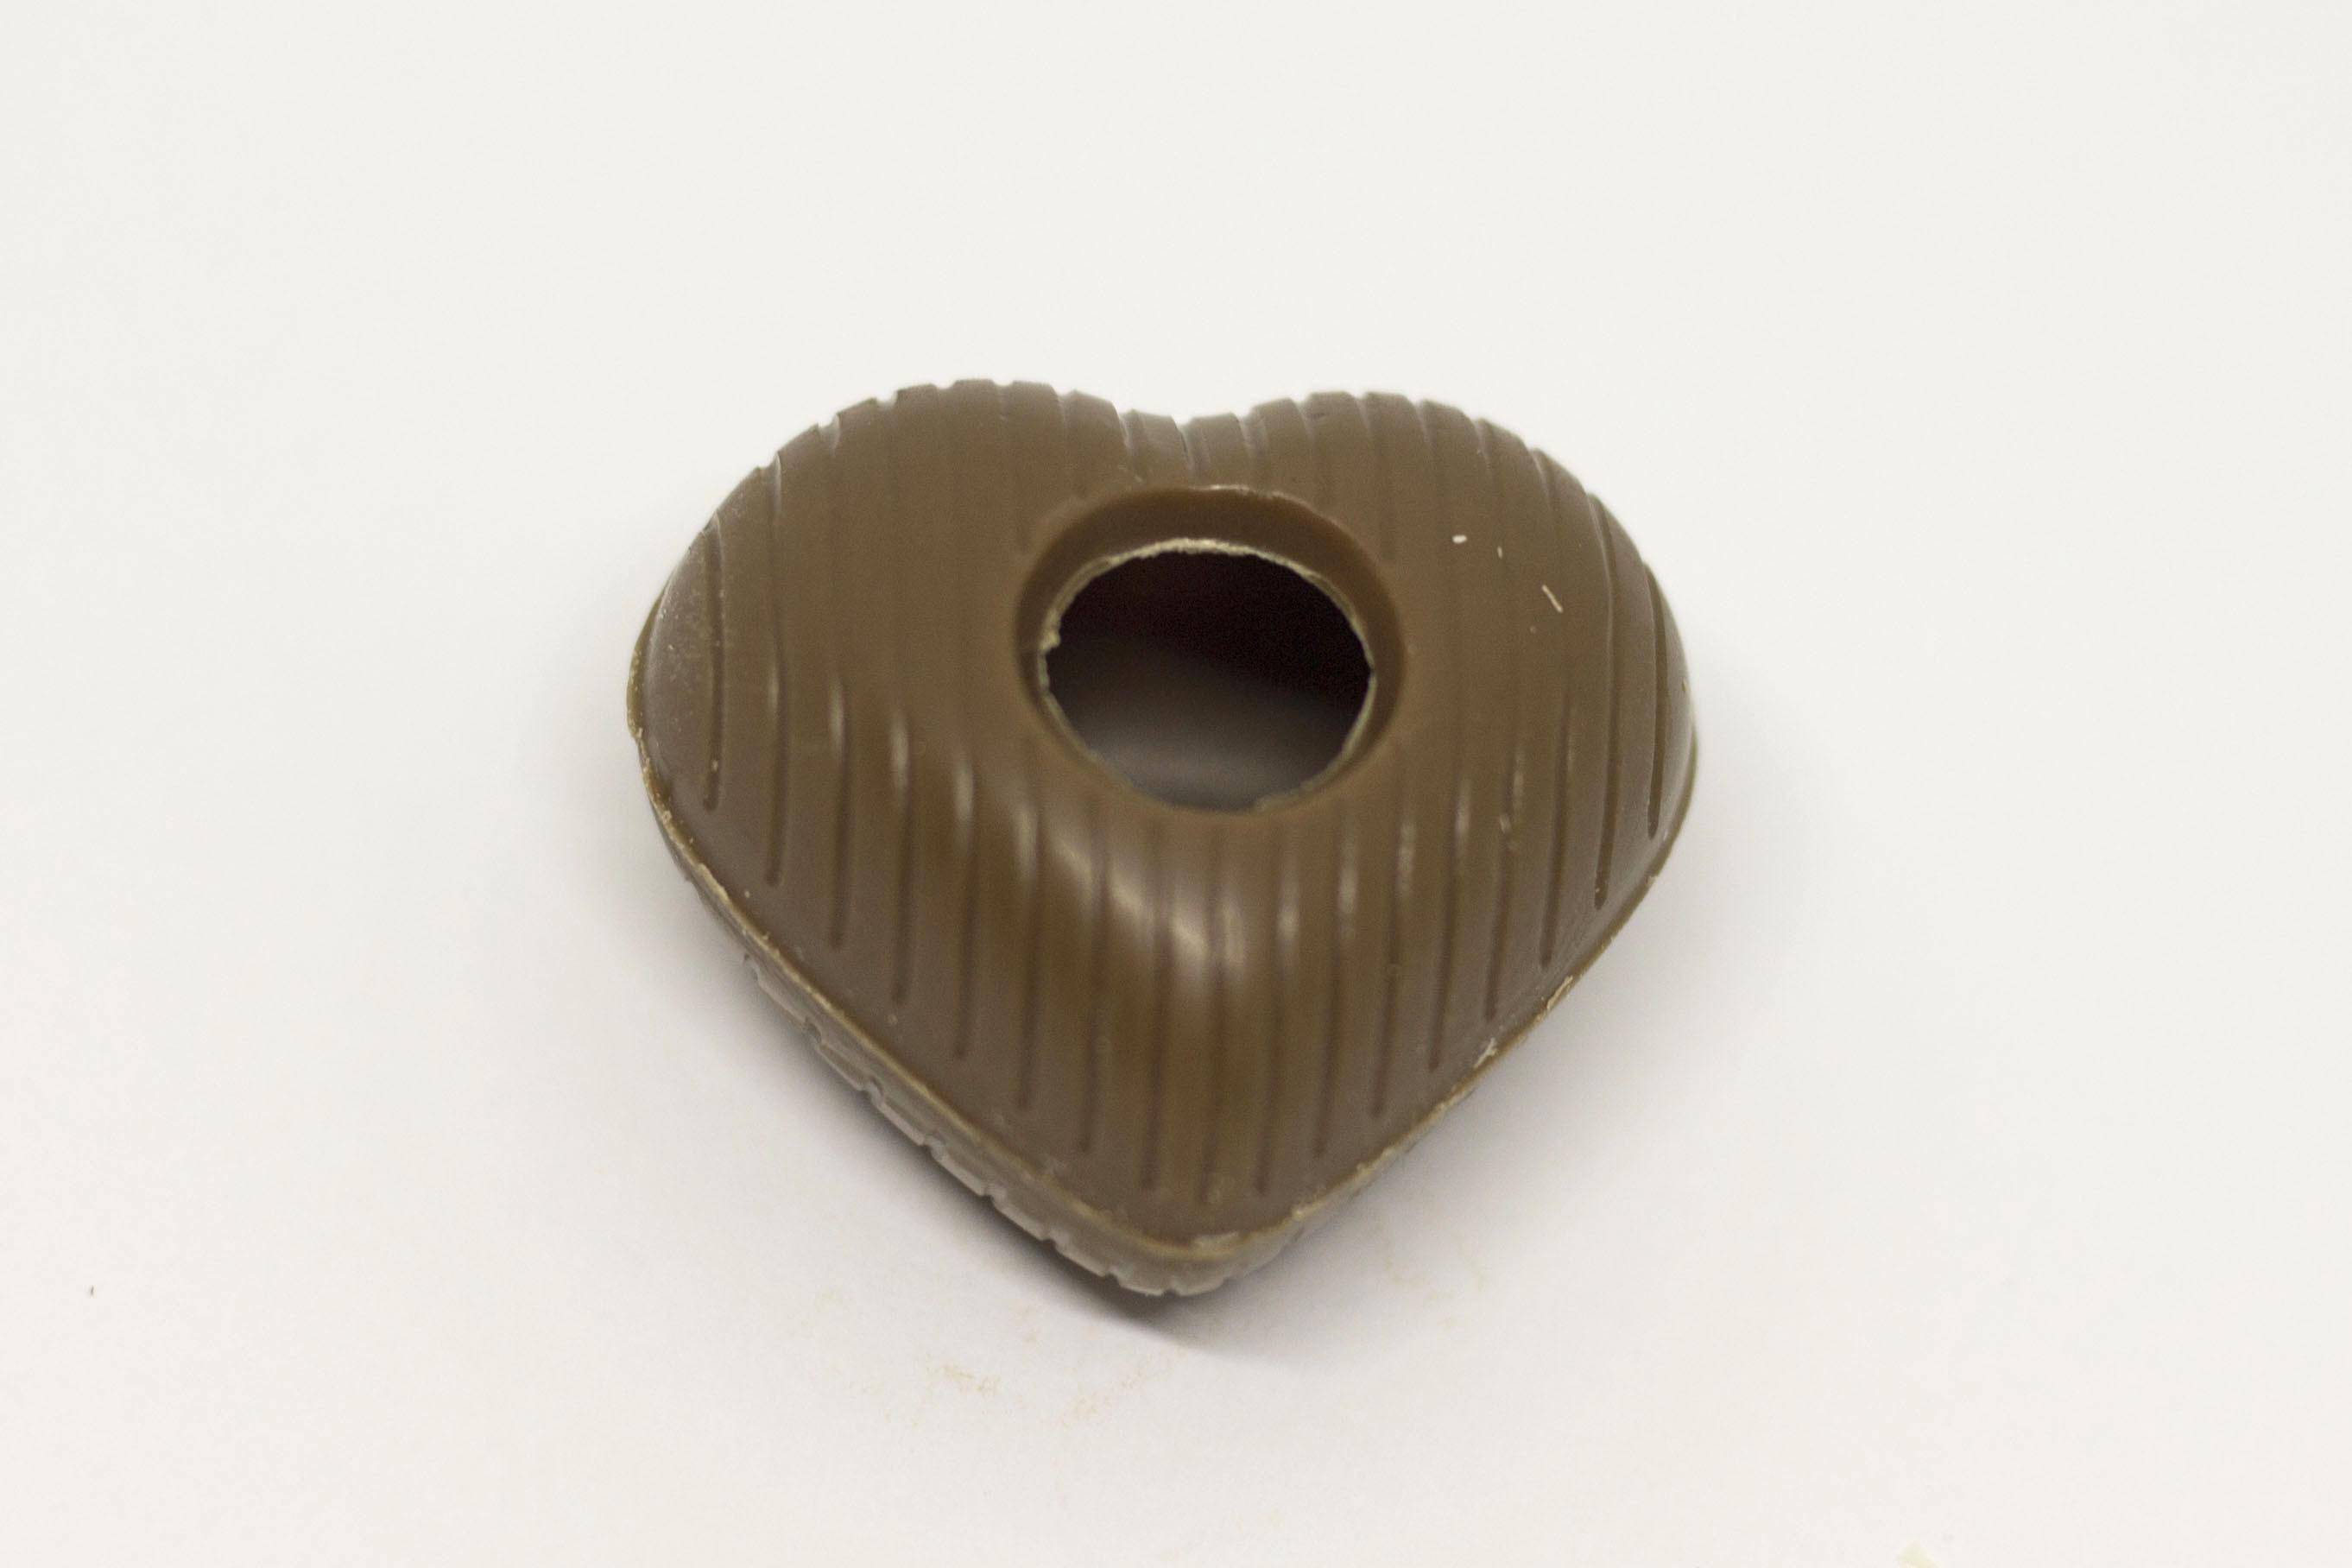 Flødechokolade hjerte